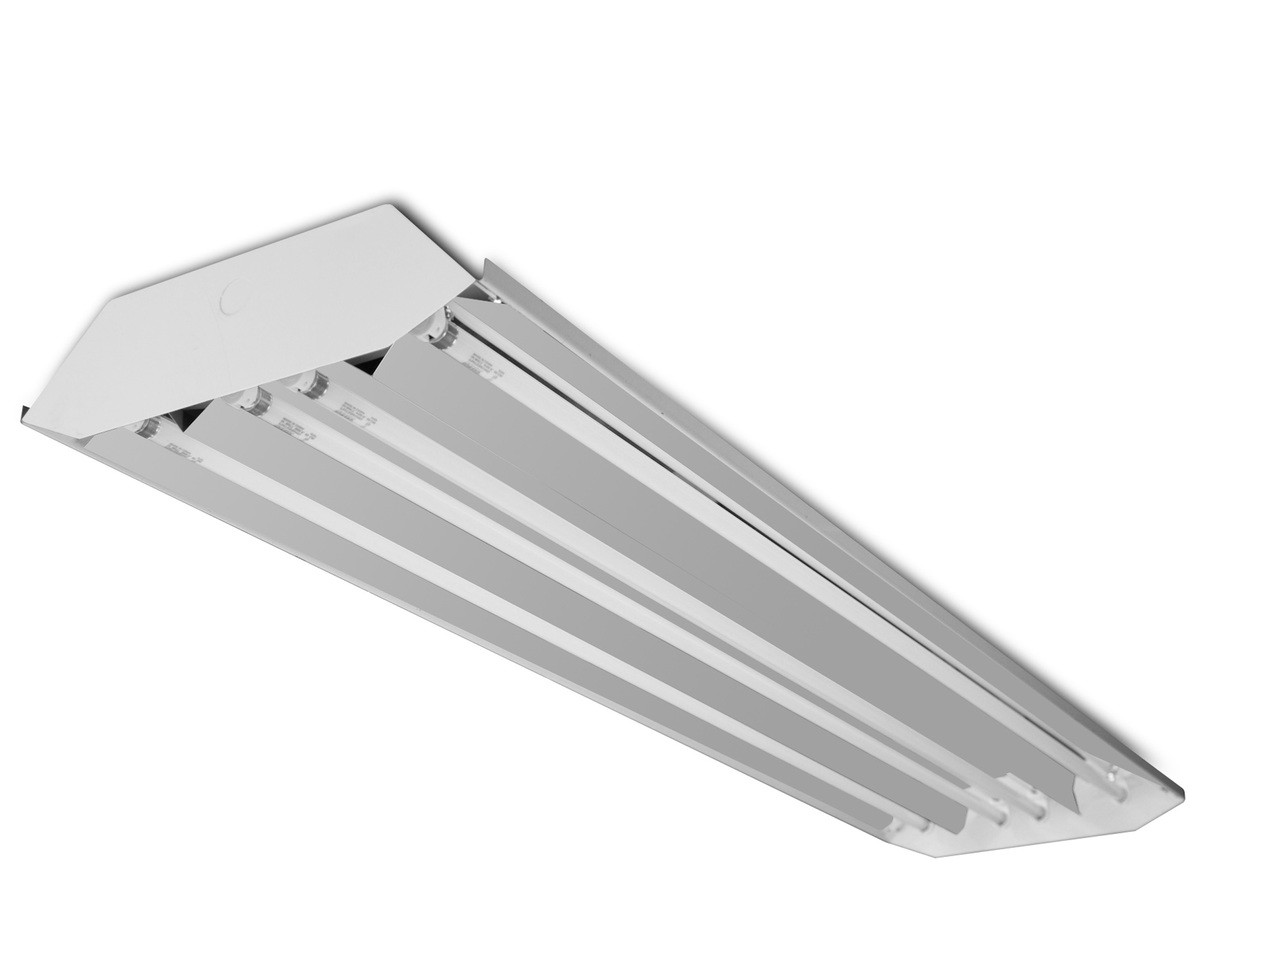 save off deb43 f0cb9 Howard Lighting HFB3E454APSMV000000I 4 Lamp 54W T5 High Bay Fluorescent  Fixture